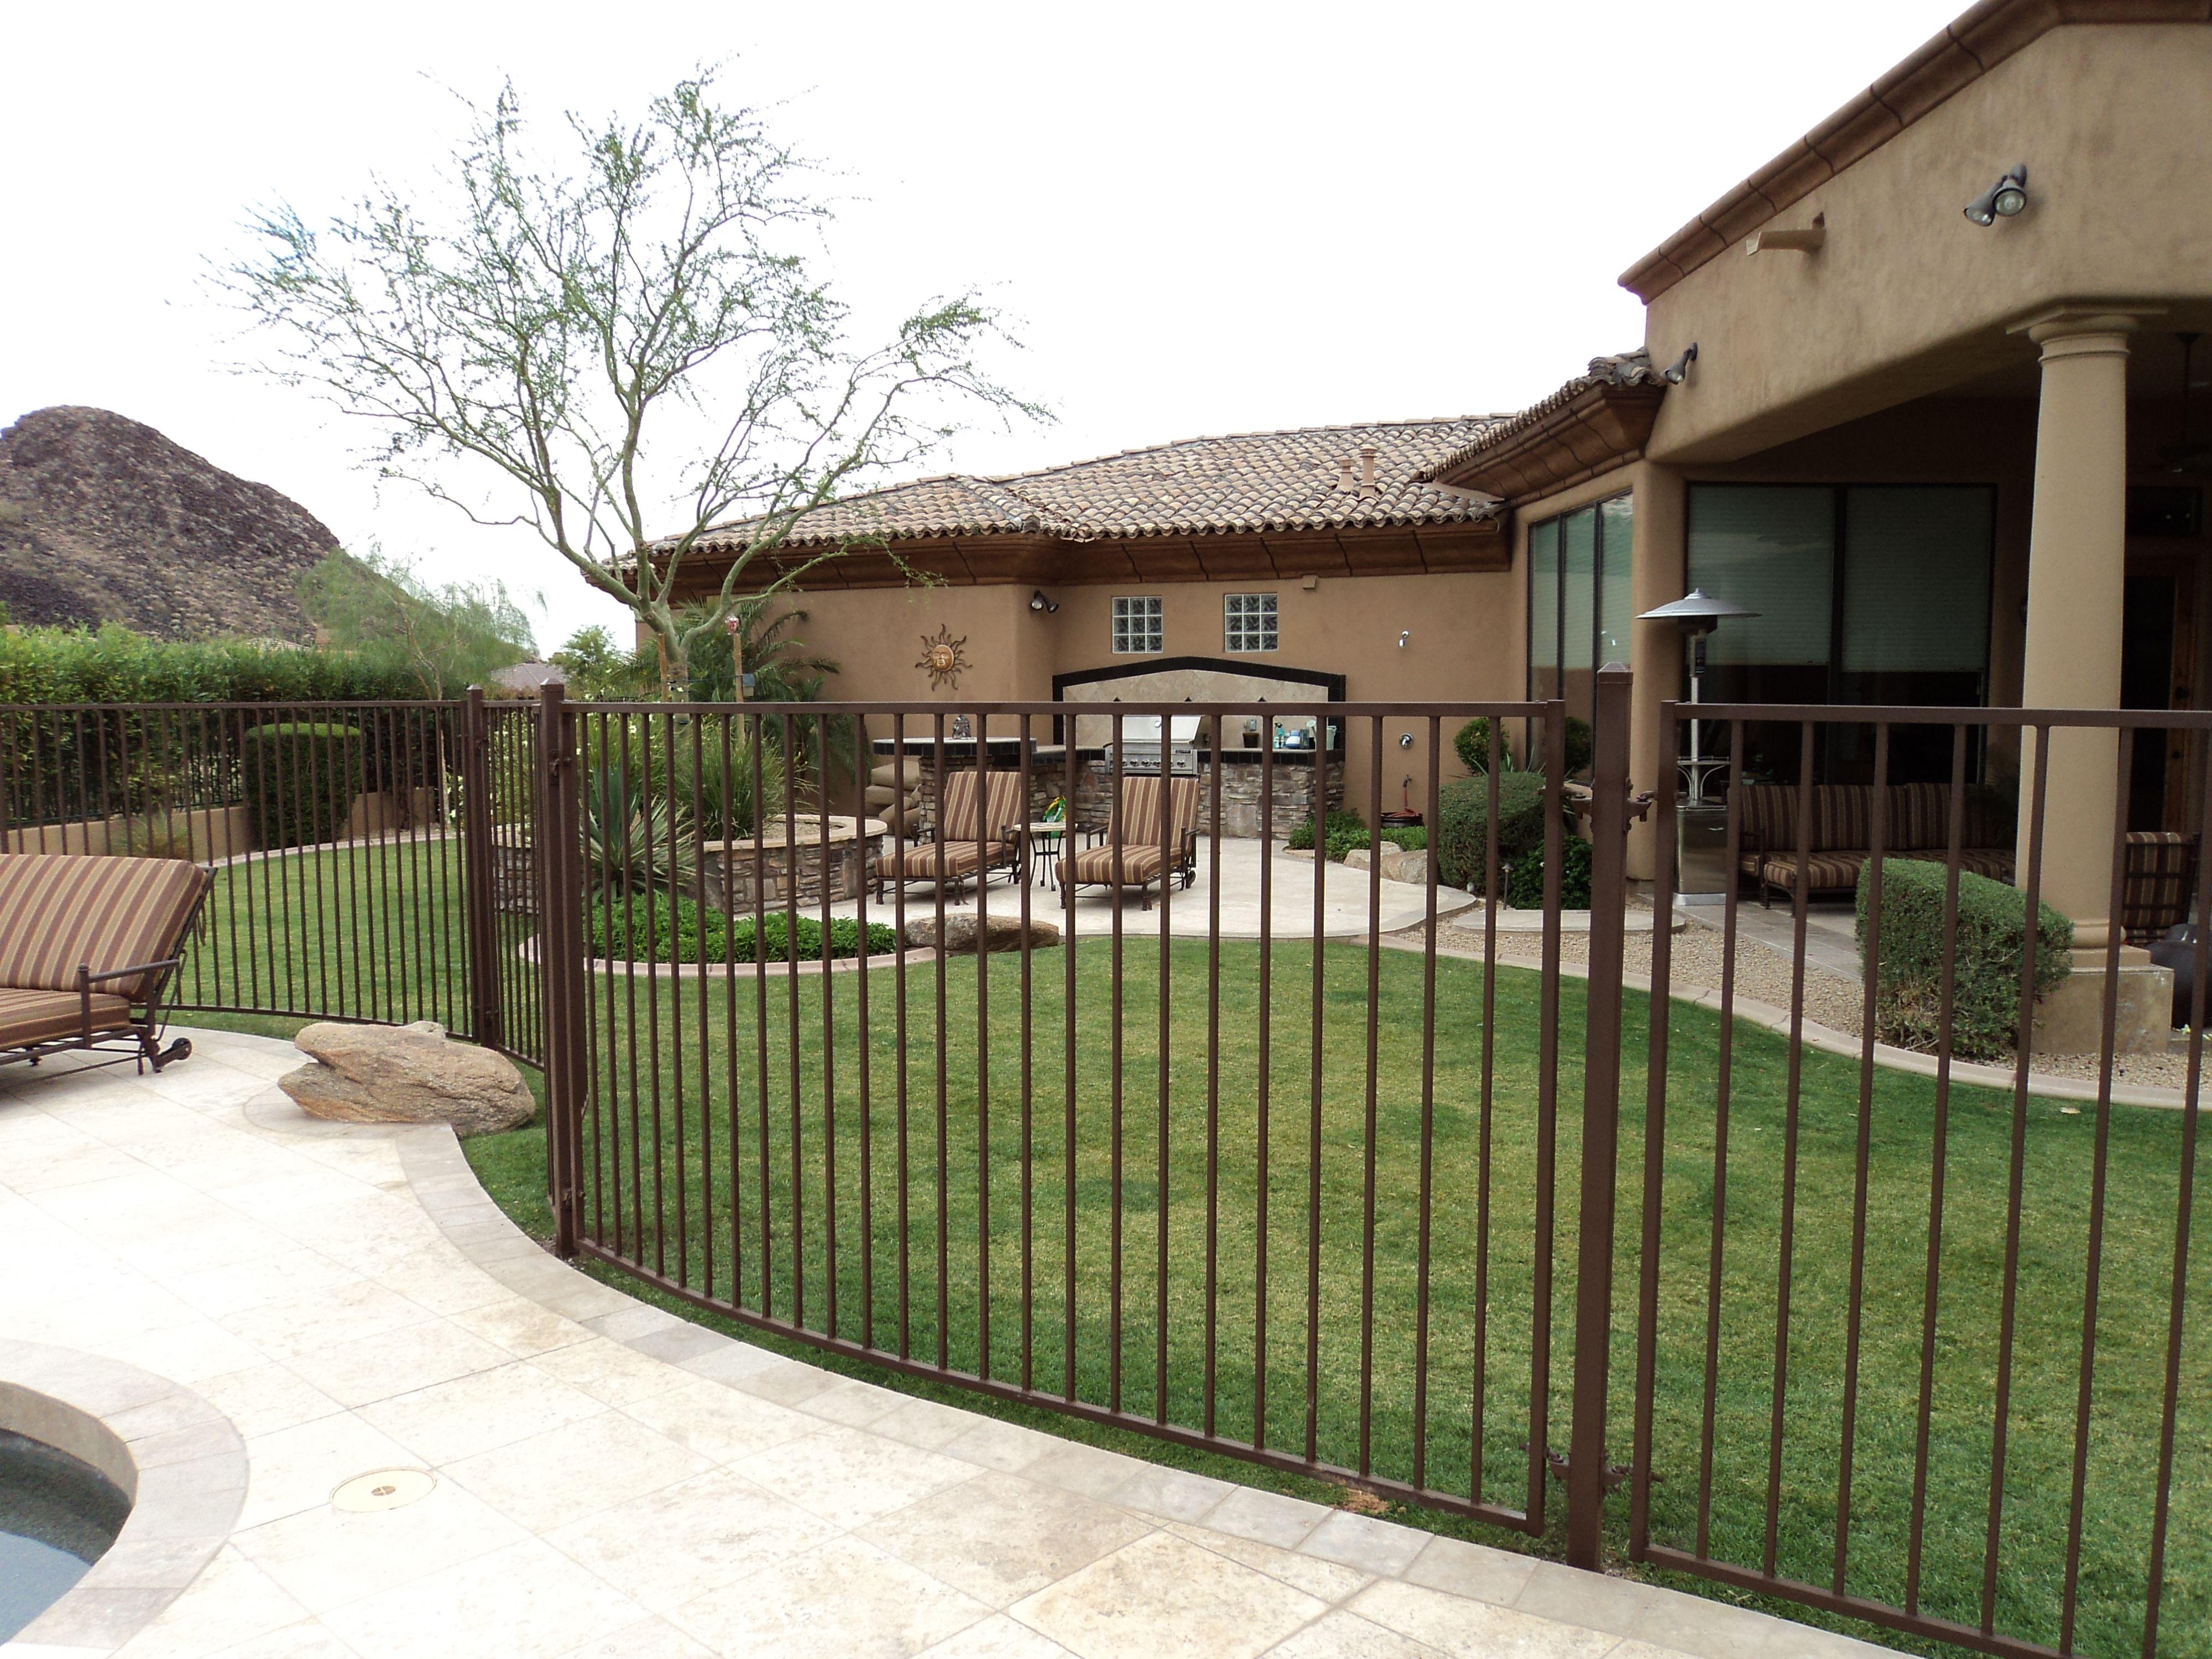 Image detail for Arizona Pool Fencing, Scottsdale Fencing